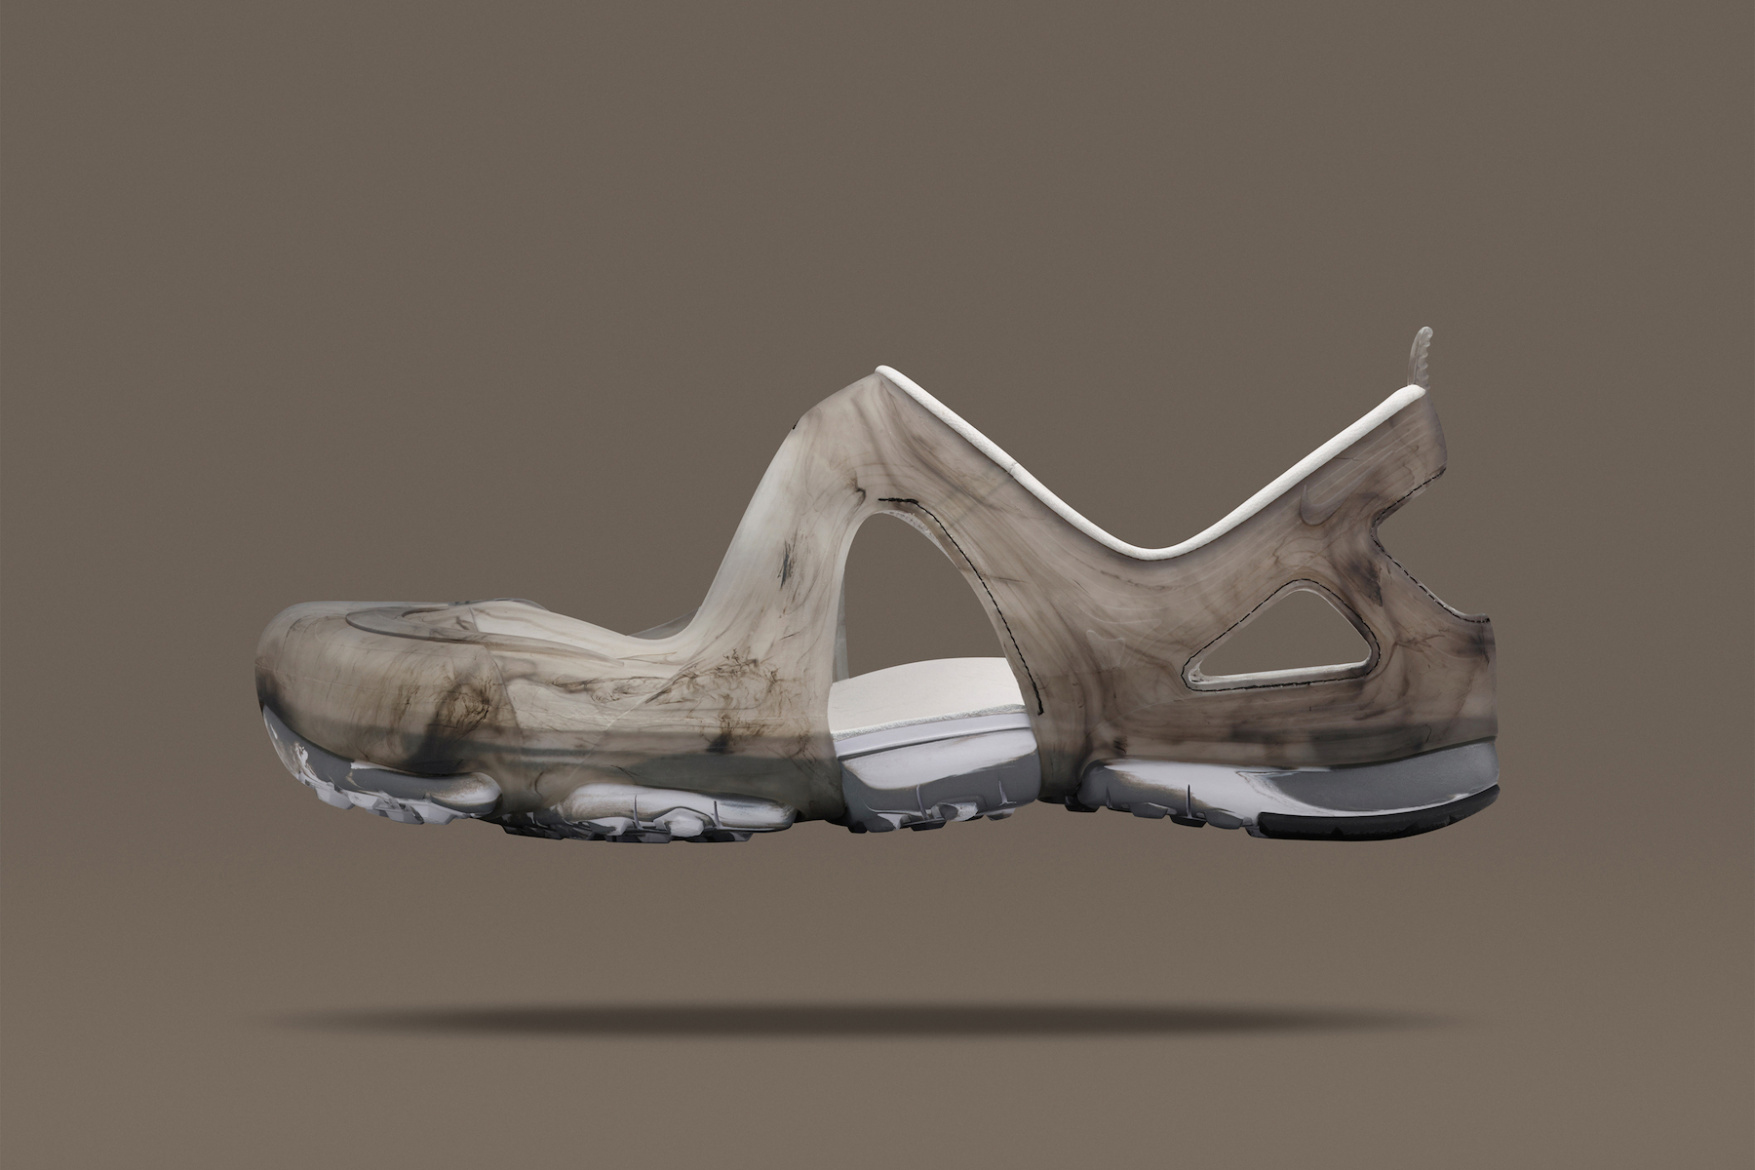 nikelab-free-rift-sandal-2016-1.jpg?qual